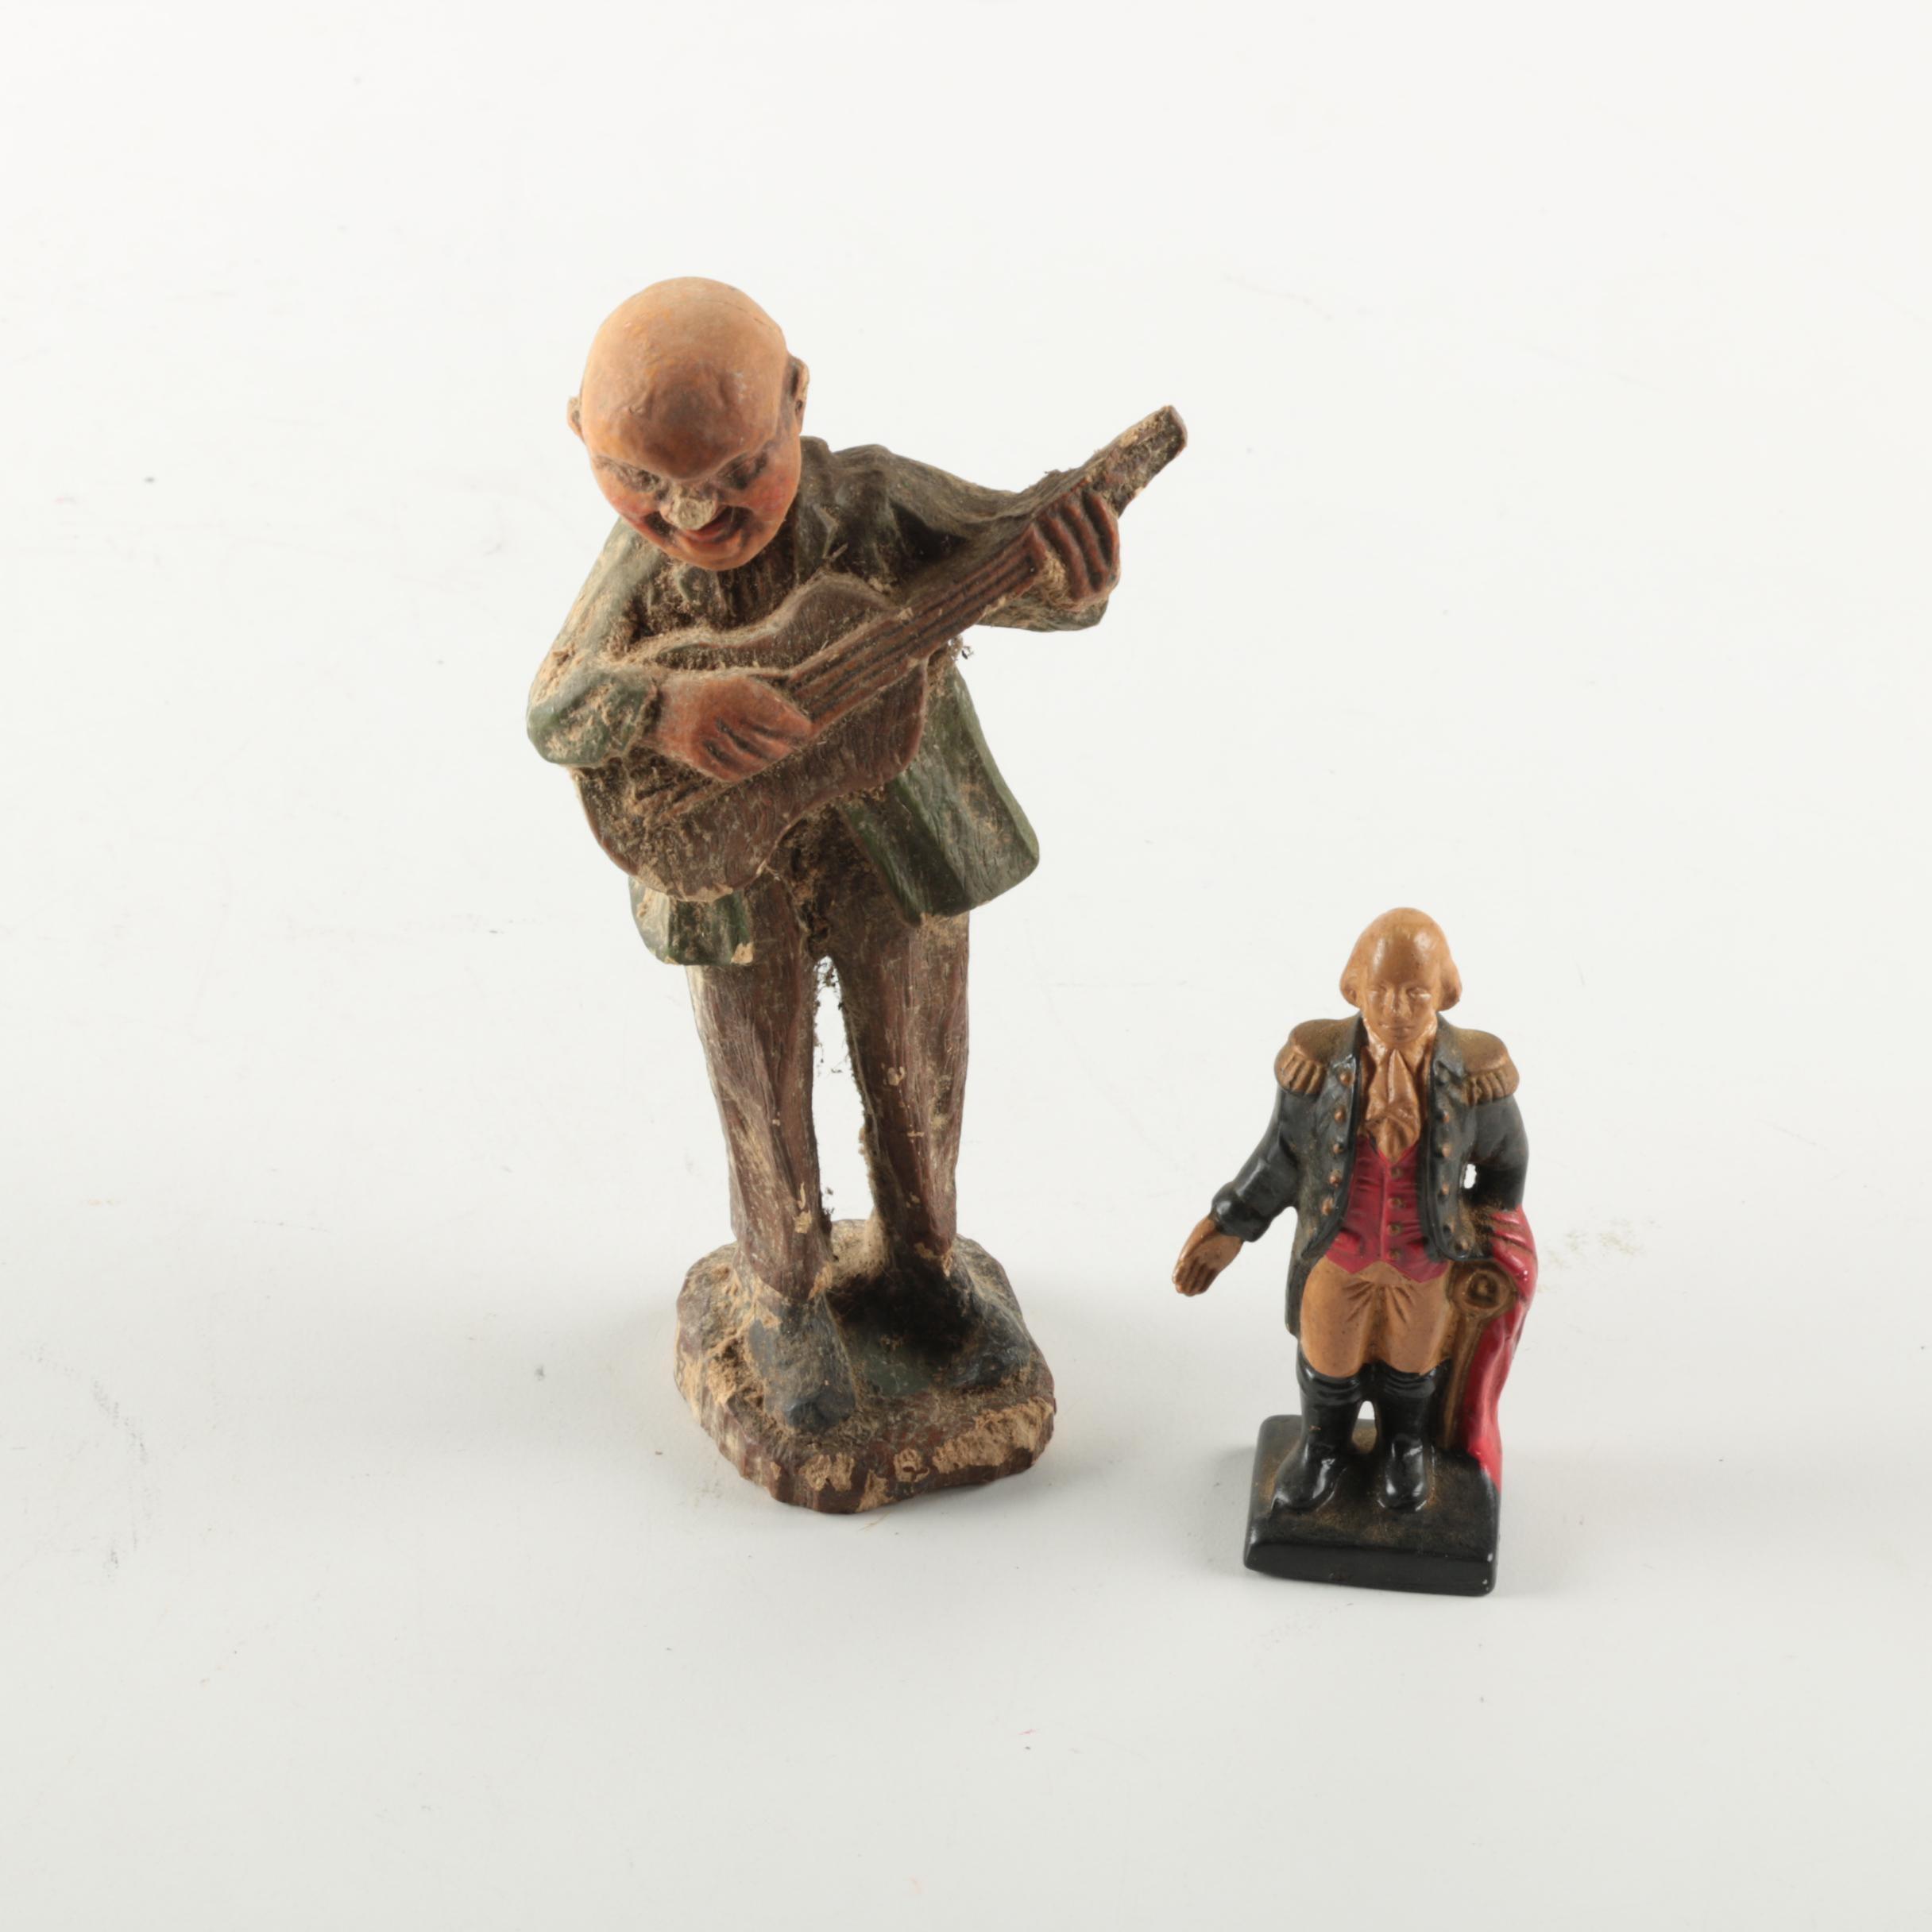 Ceramic Figurines of George Washington and Guitarist